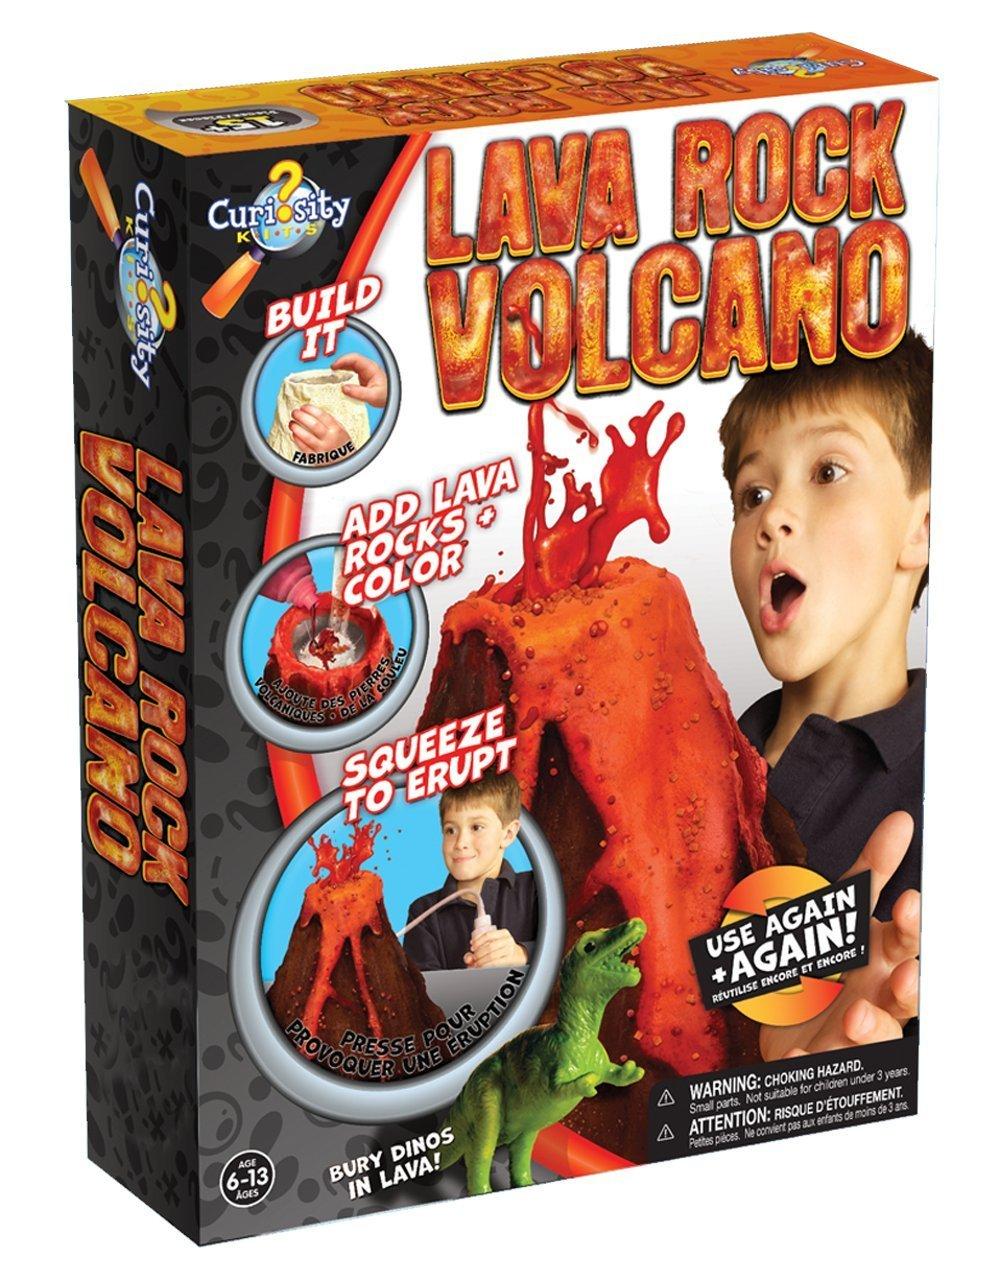 Amazon.com: Curiosity Kits Lava Rock Volcano for just $12.50!